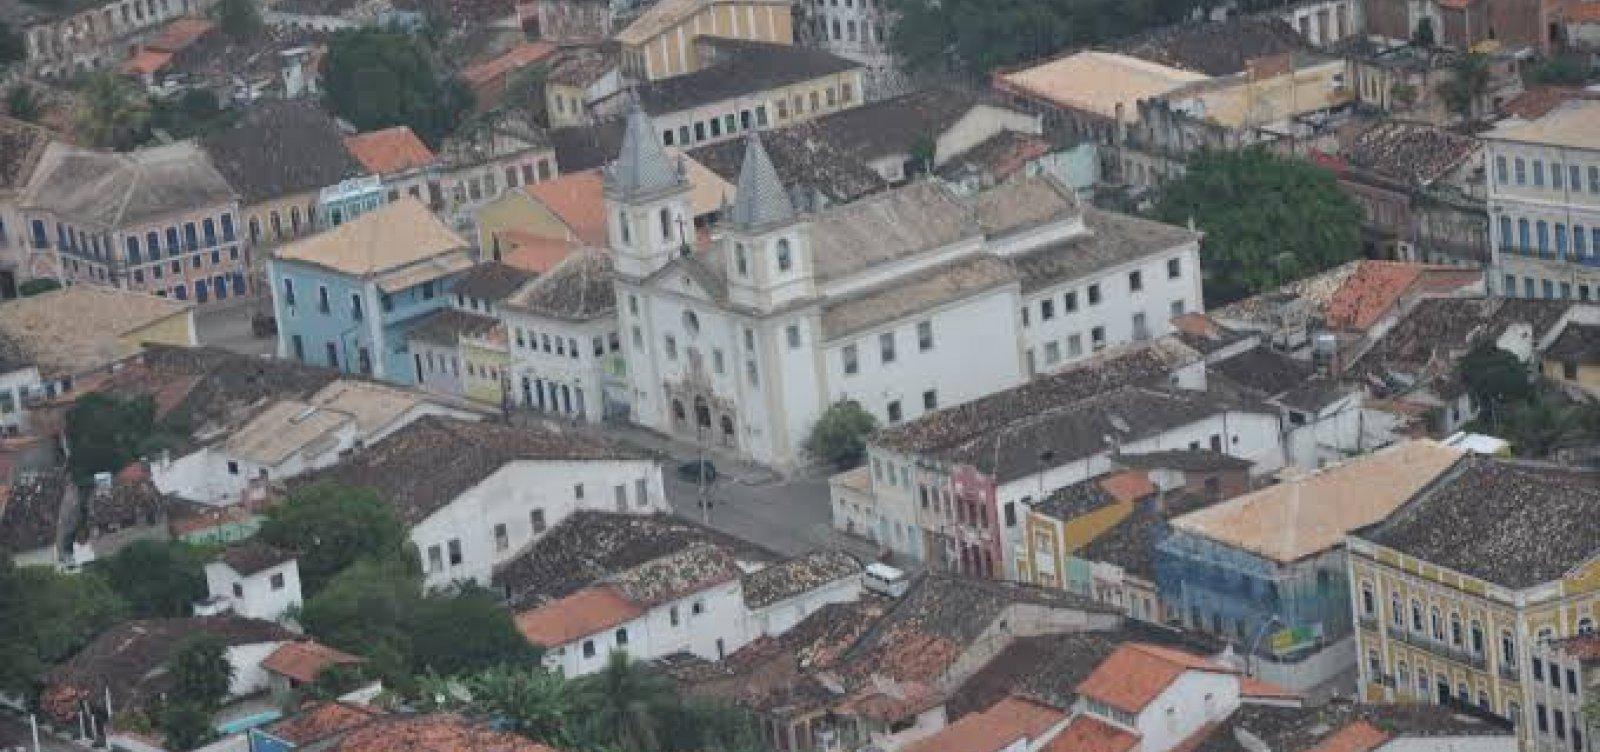 Moradores de Cachoeira relatam tremor de terra na cidade